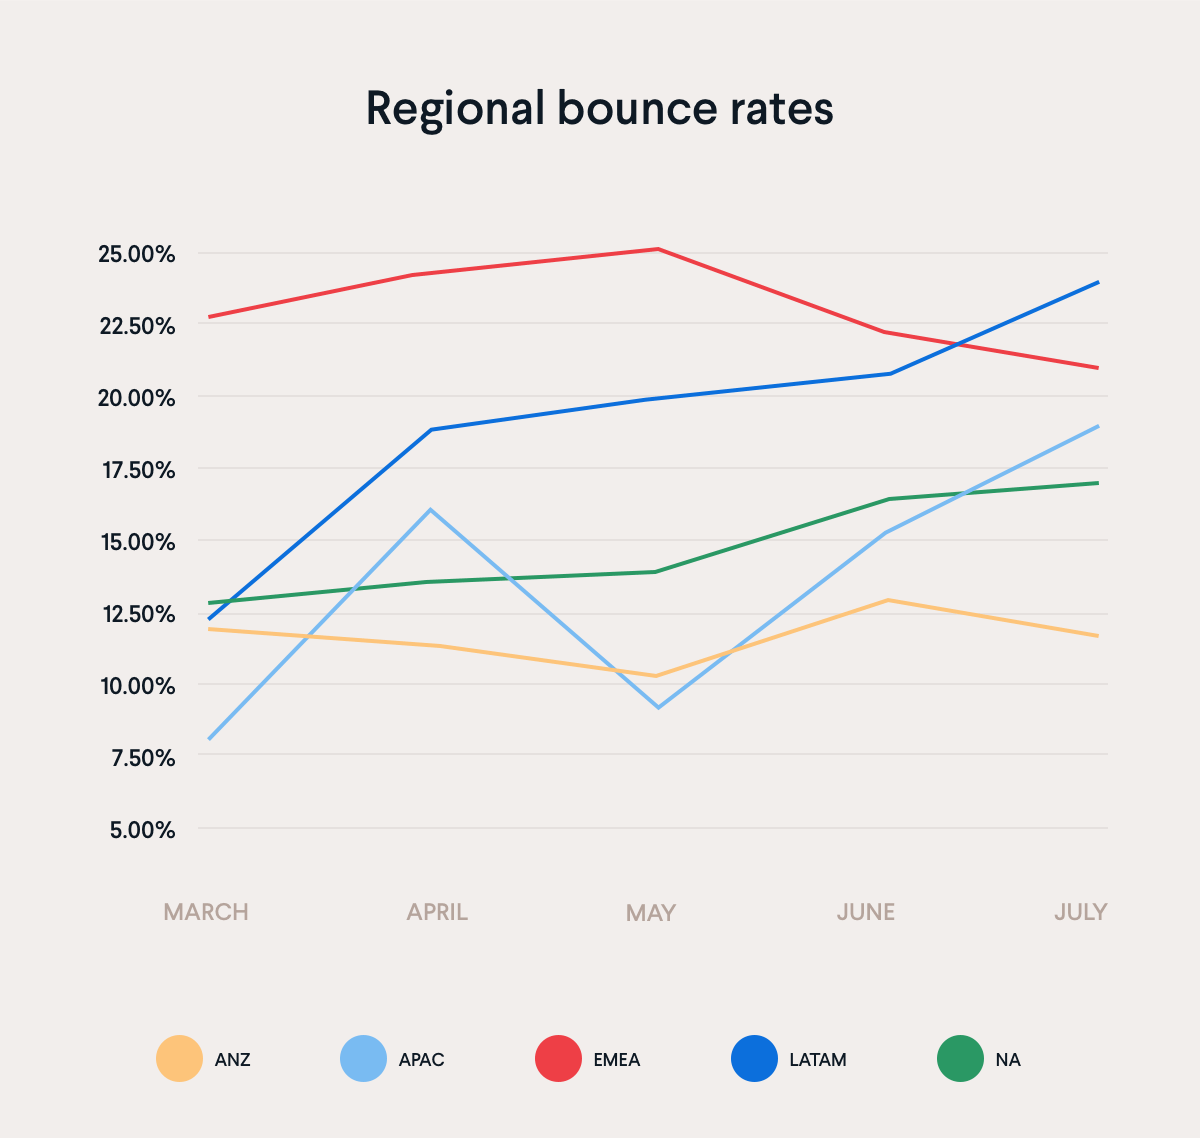 Regional bounce rates